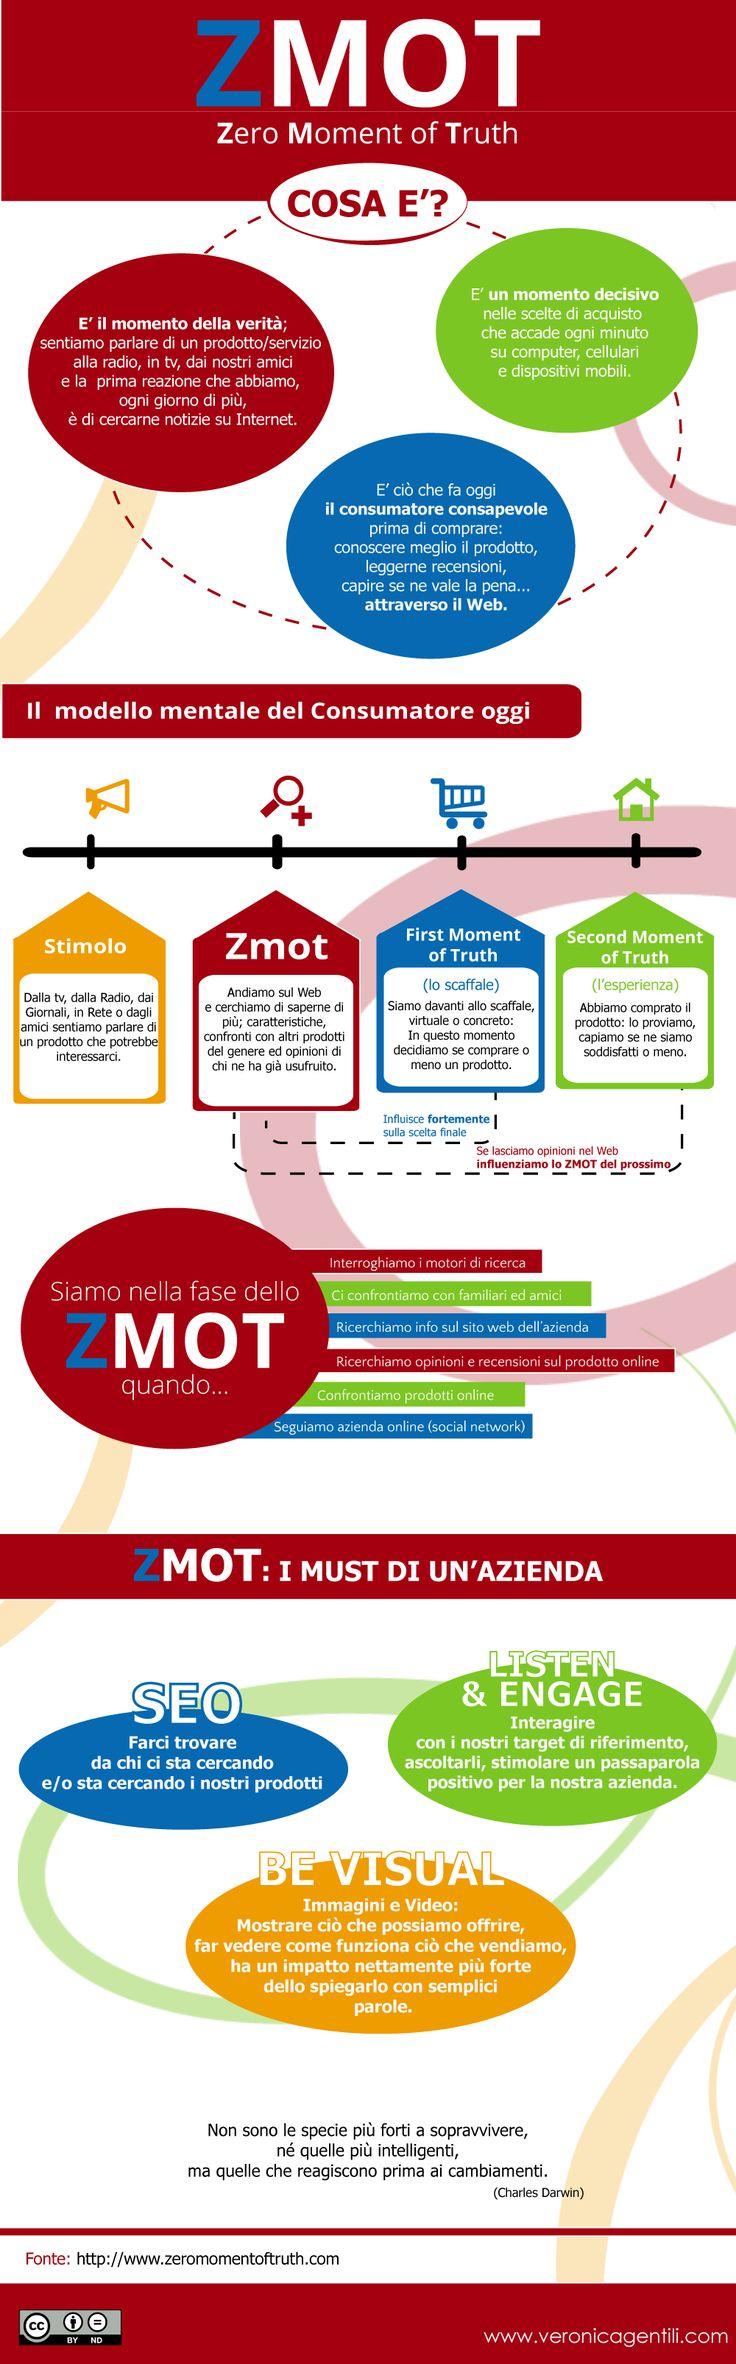 ZMOT_Zero Moment of Truth